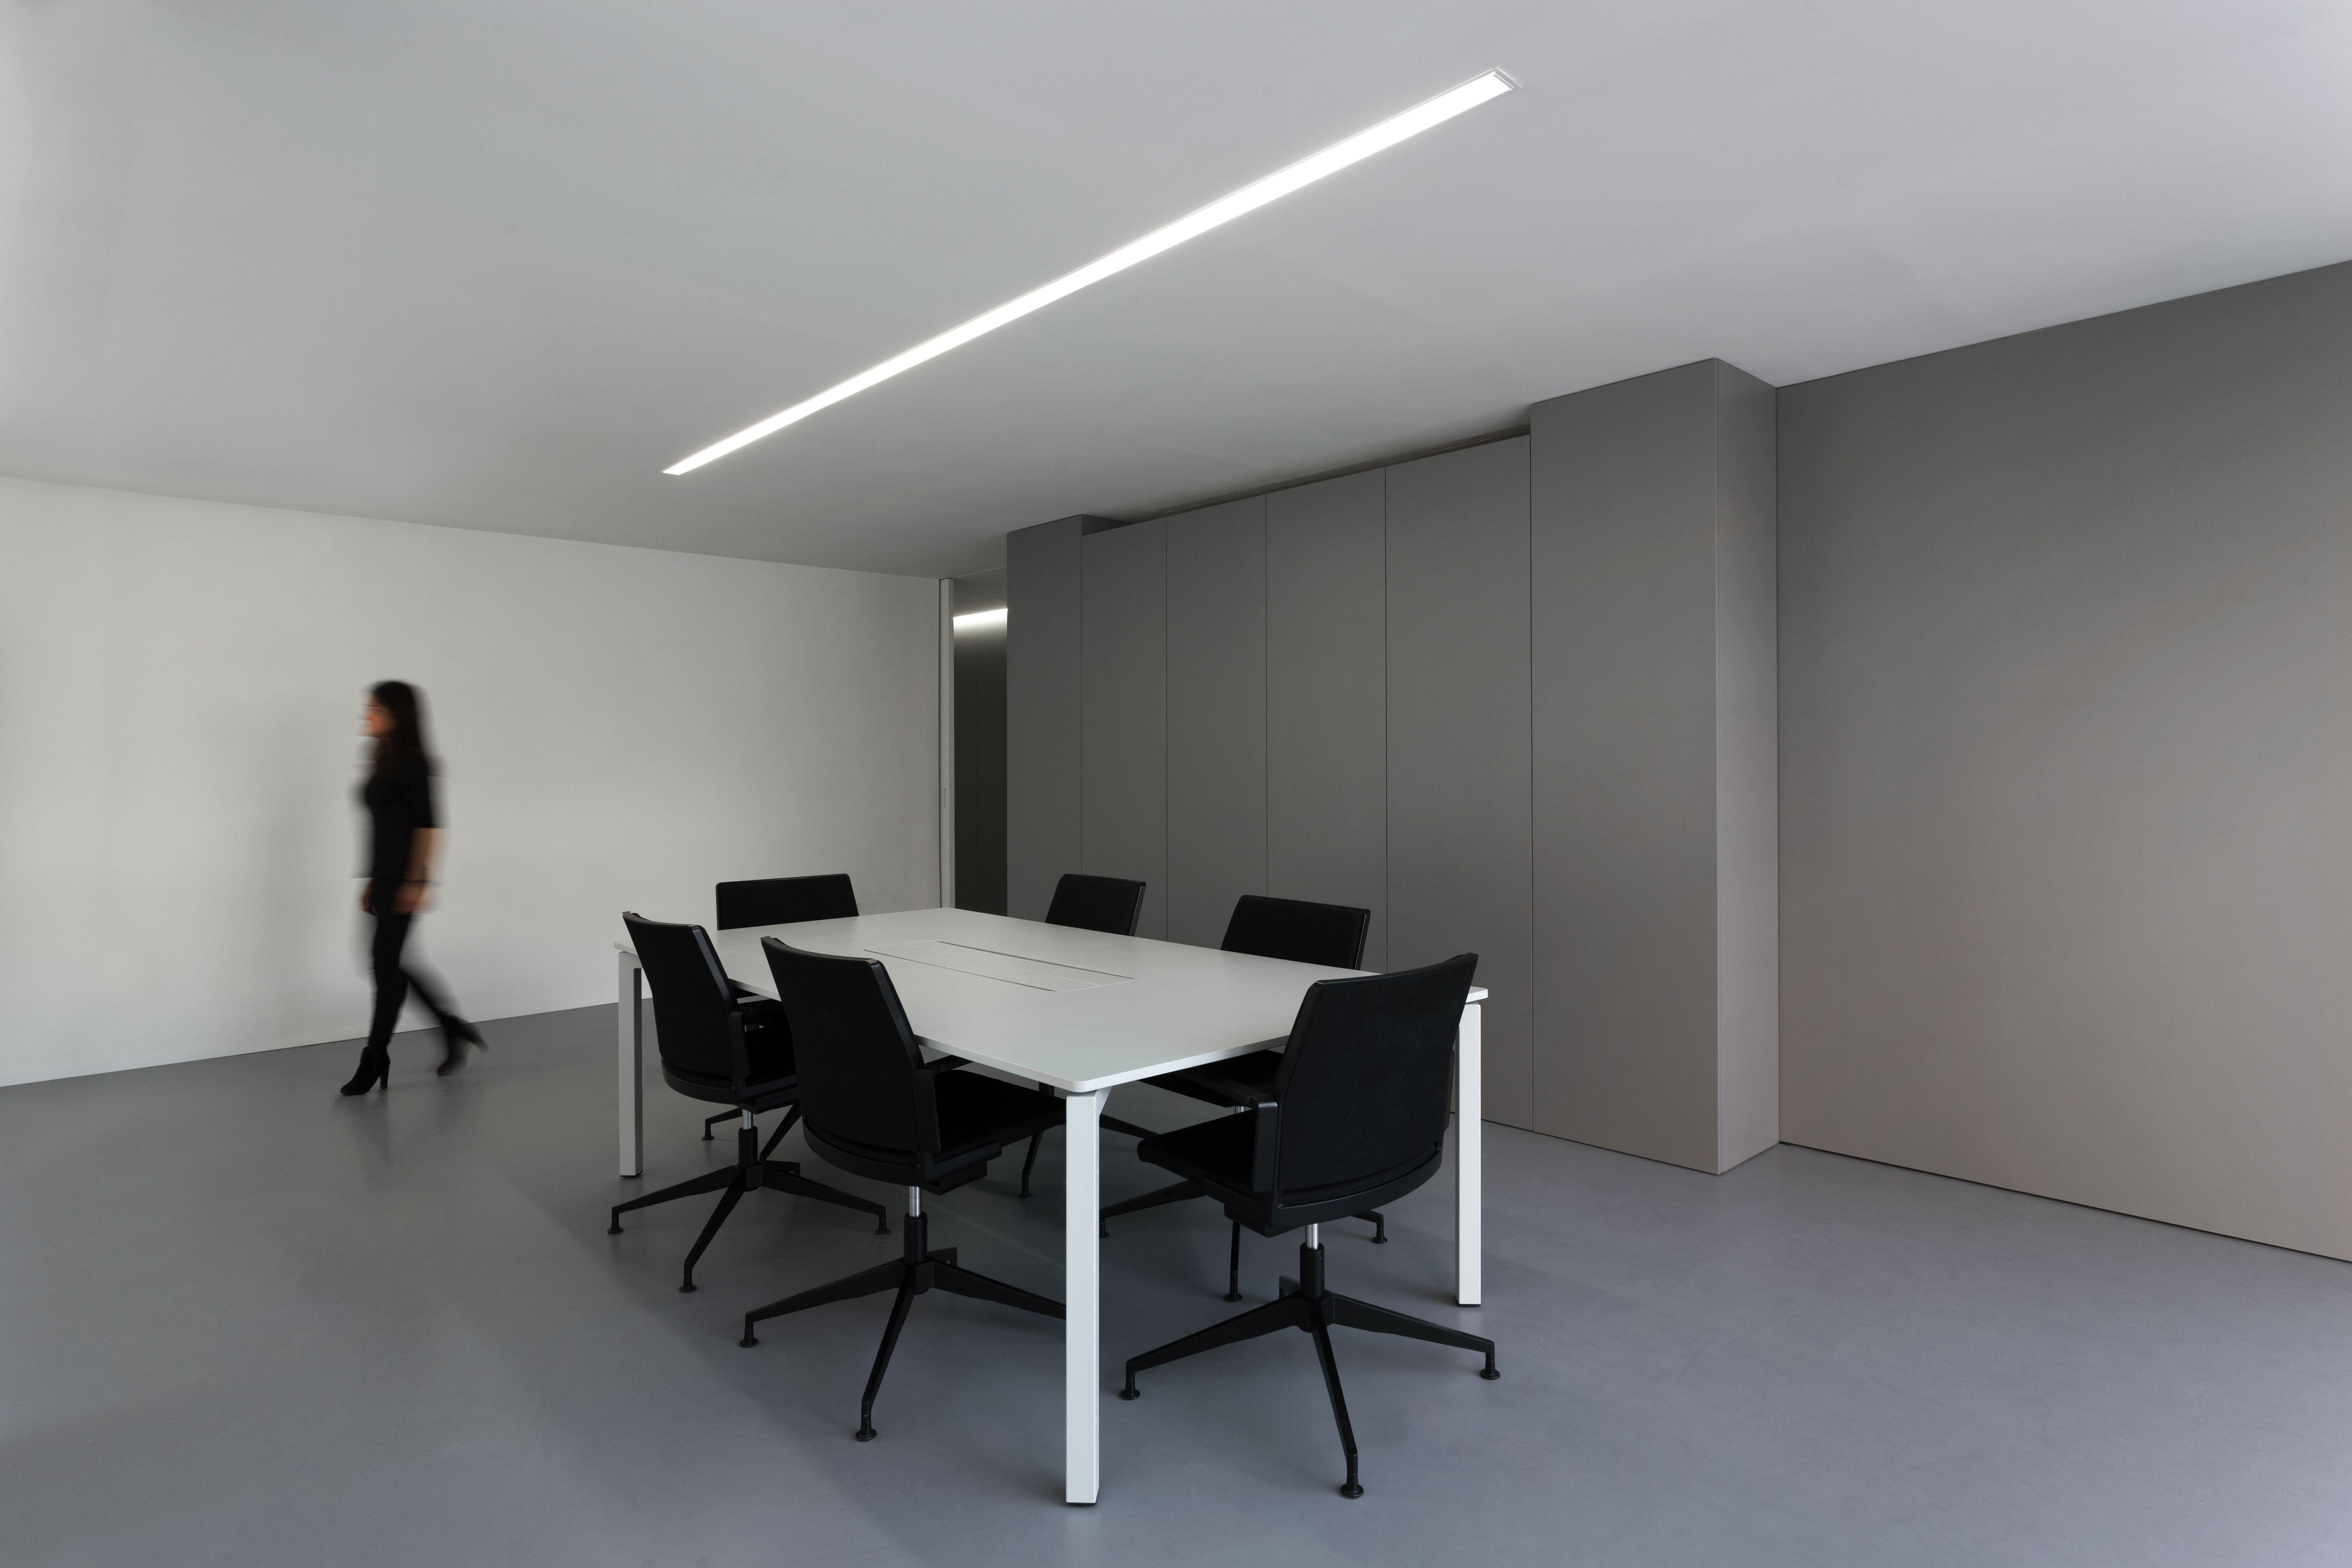 minimal office. #fransilvestrearquitectos #alfarohofmann #architecture #arquitectura # Minimal #office #space #lineallight #workspace #oficina #luz #white #interiordesign Office I